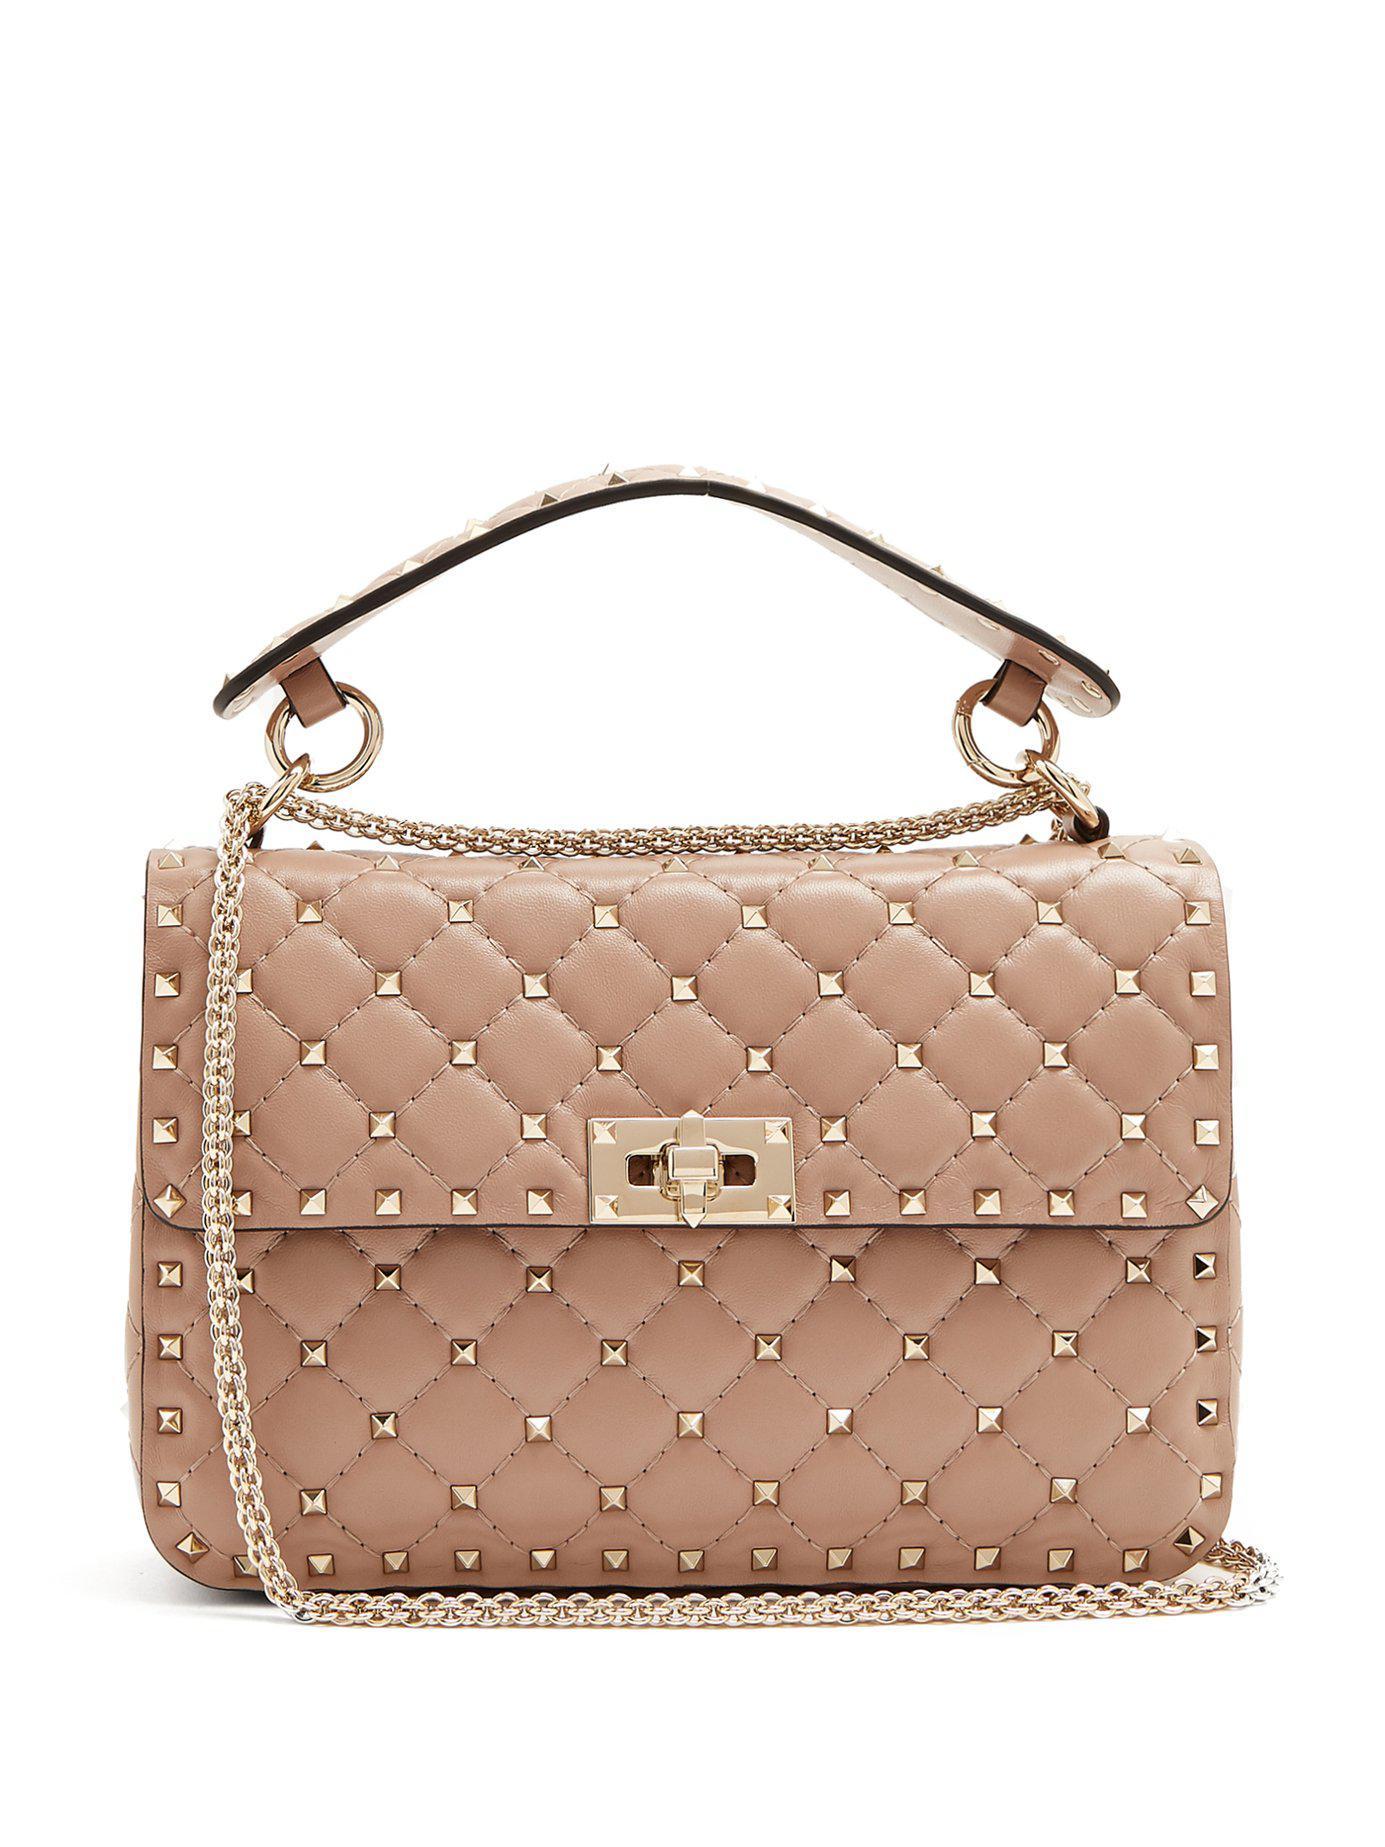 15f25614c171 Valentino. Women s Rockstud Spike Medium Quilted Leather Shoulder Bag